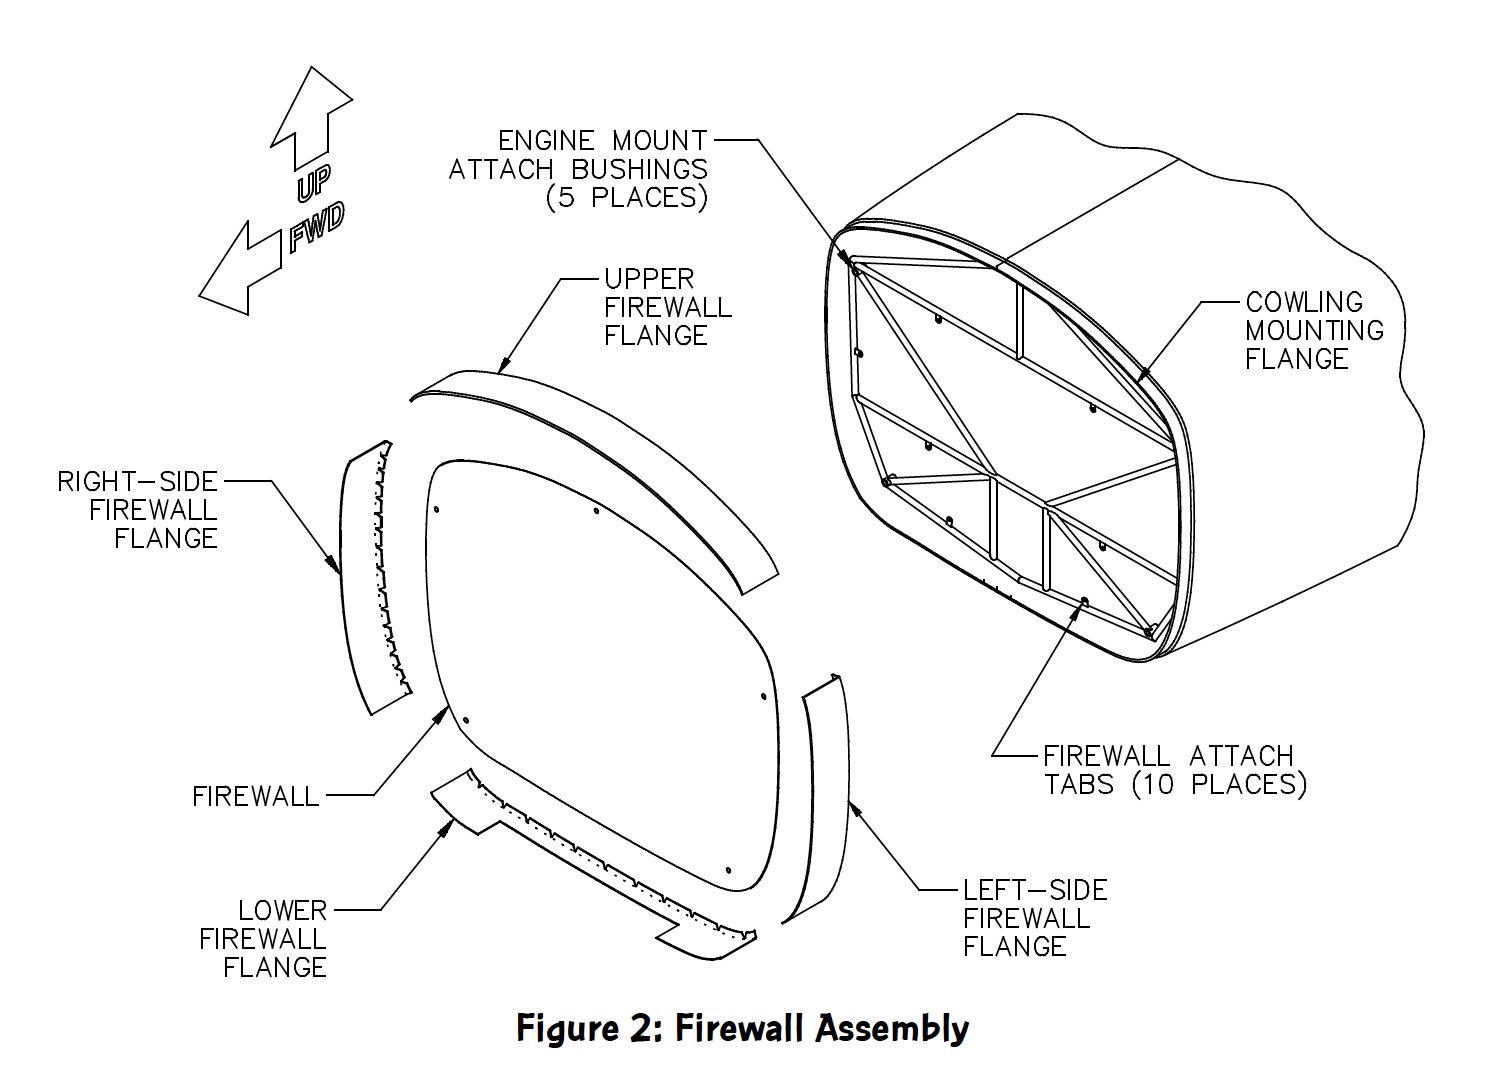 glastar firewall assembly drawing